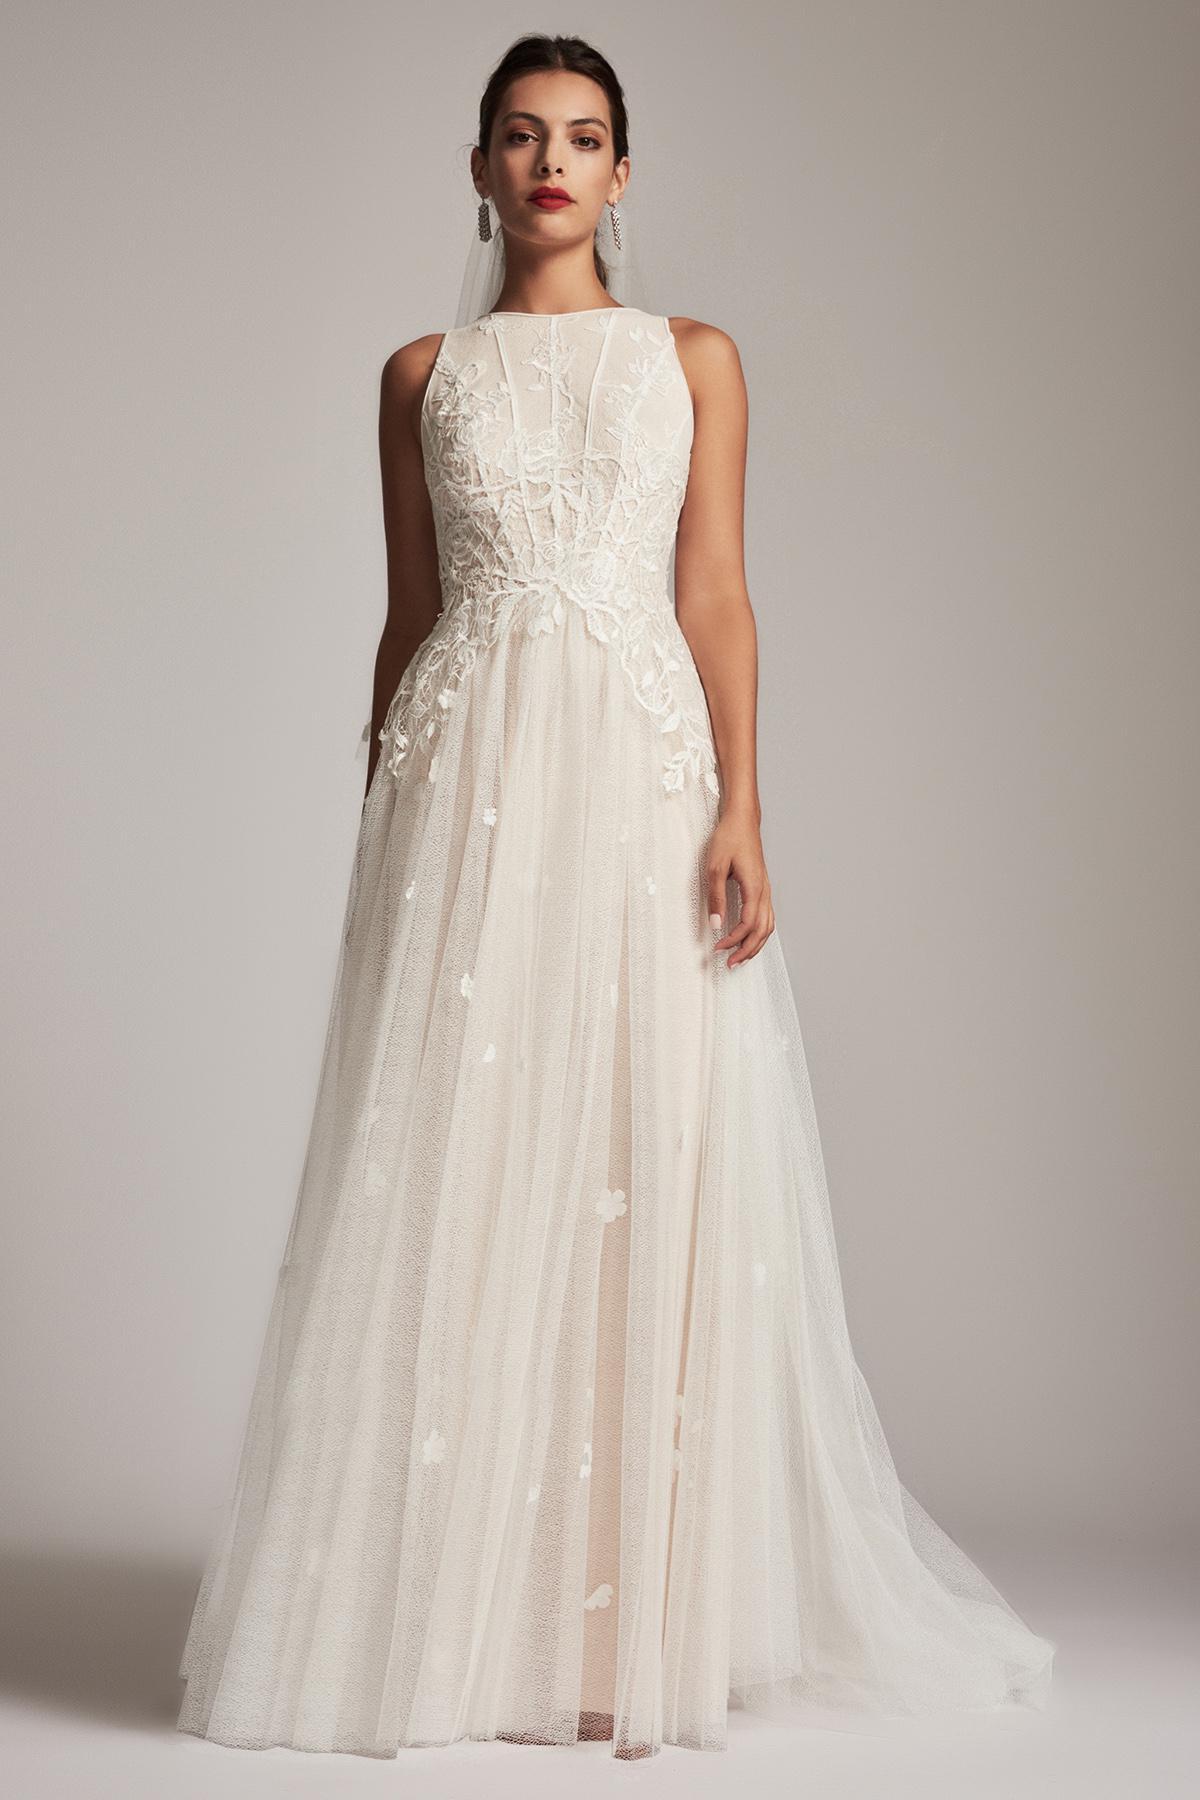 Lyst - Tadashi Shoji Delphia Ball Gown in White 283b953a0